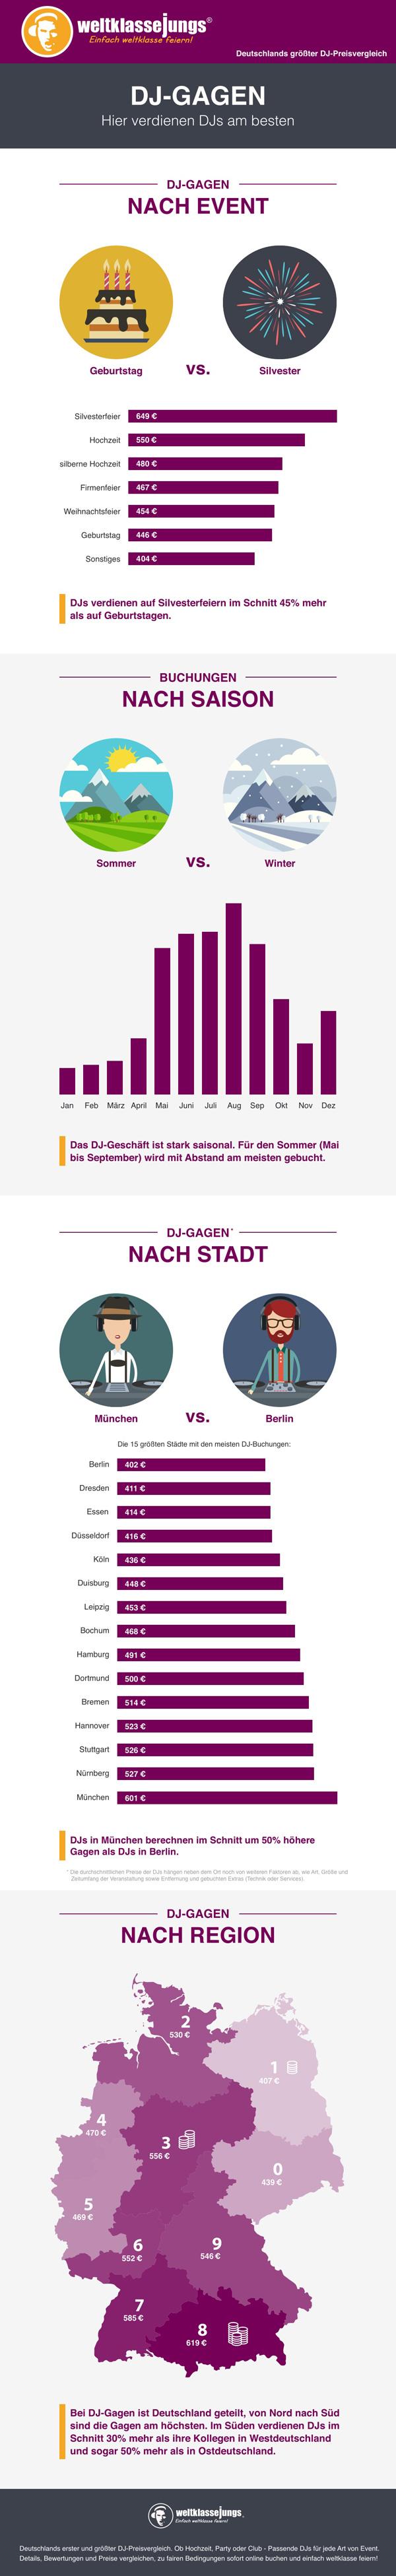 wkj-infografik-dj-gagen_web